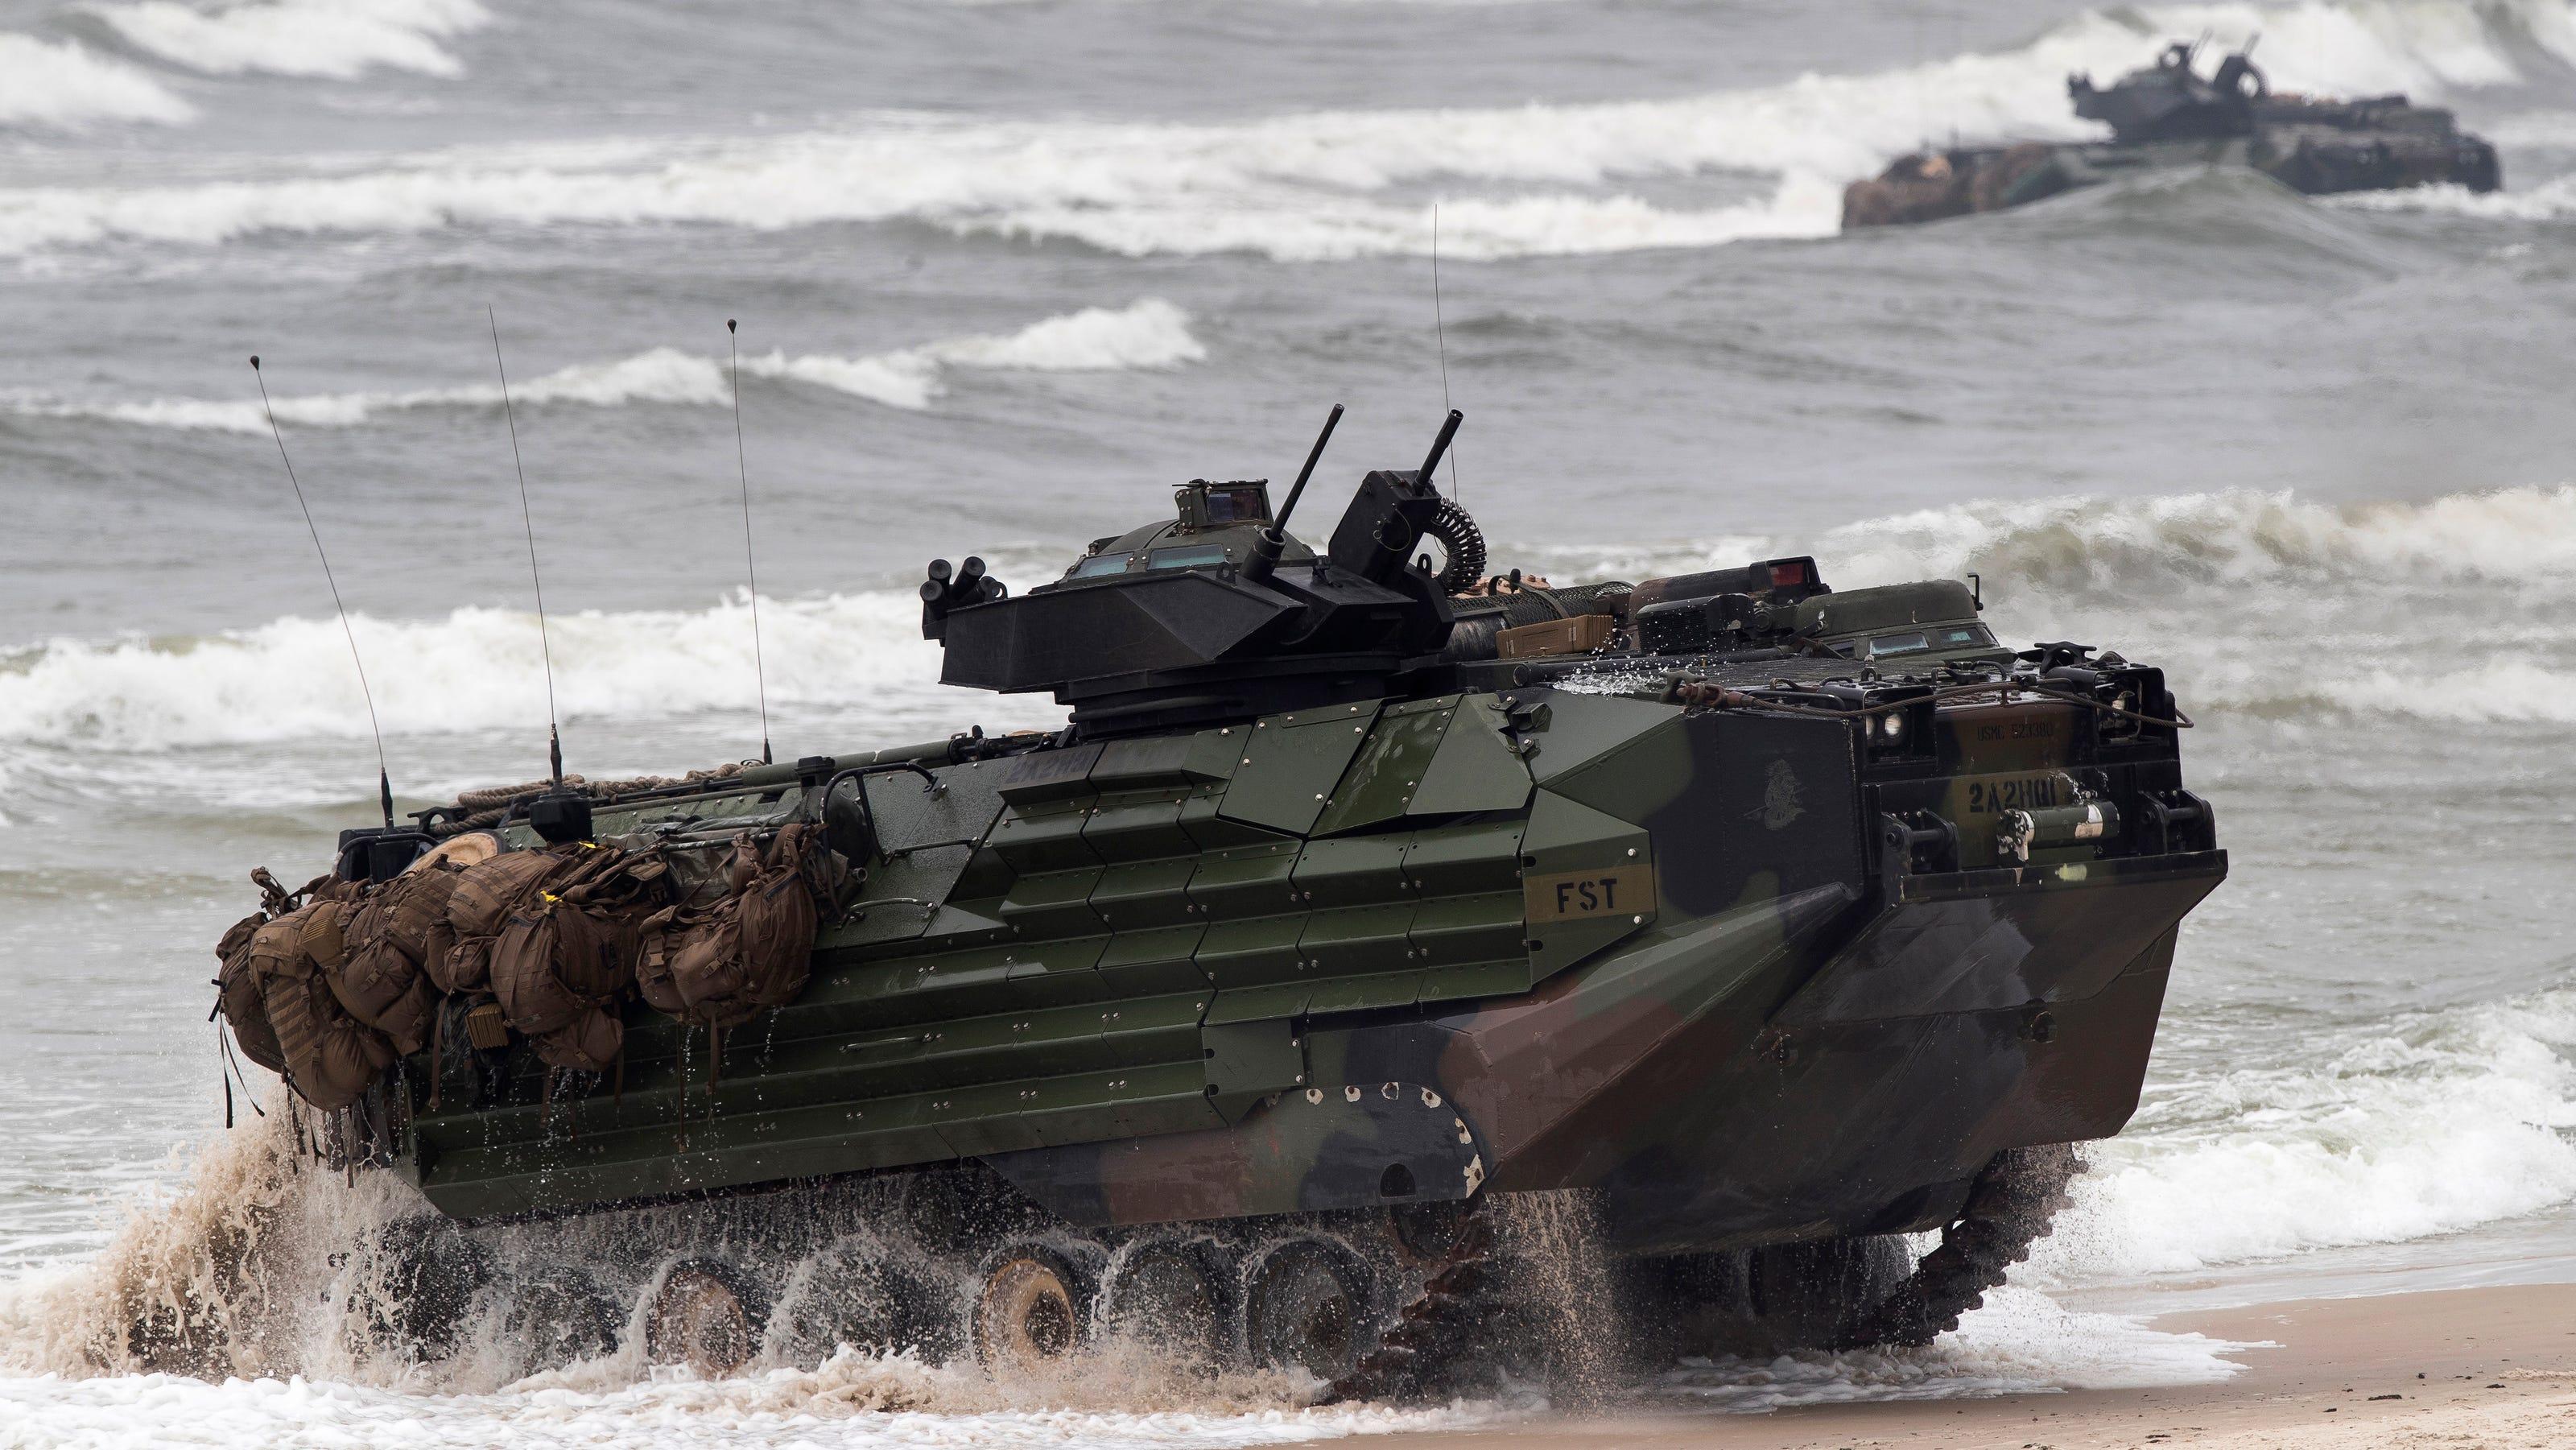 7 Marines, Navy sailor presumed dead as rescue effort halted in tragedy off California Coast